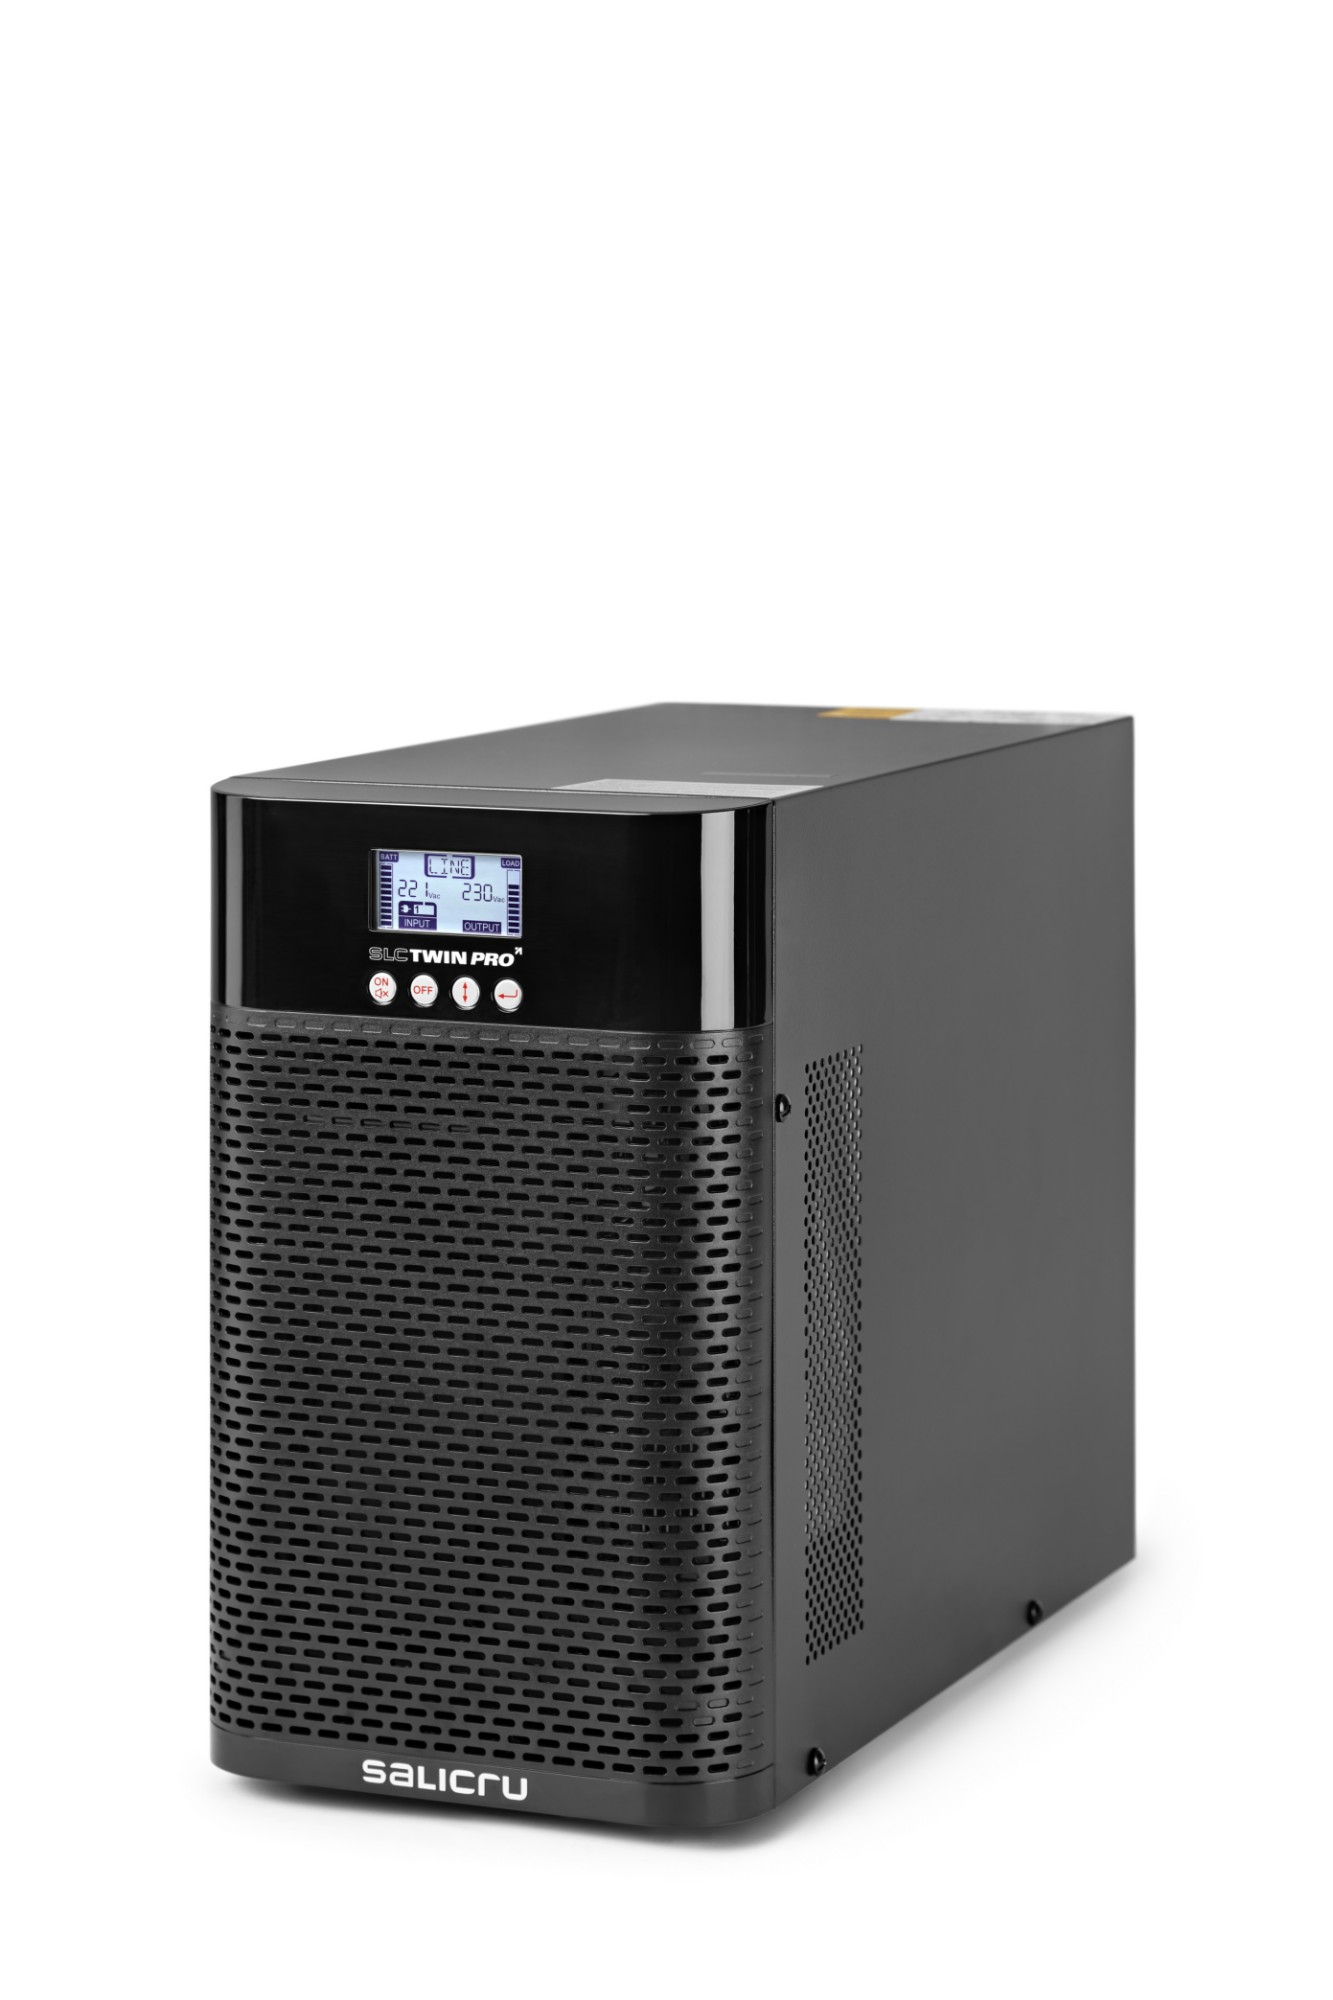 Salicru SLC 3000 TWIN PRO2 IEC SAI On-line doble conversión de 700 VA a 3000 VA